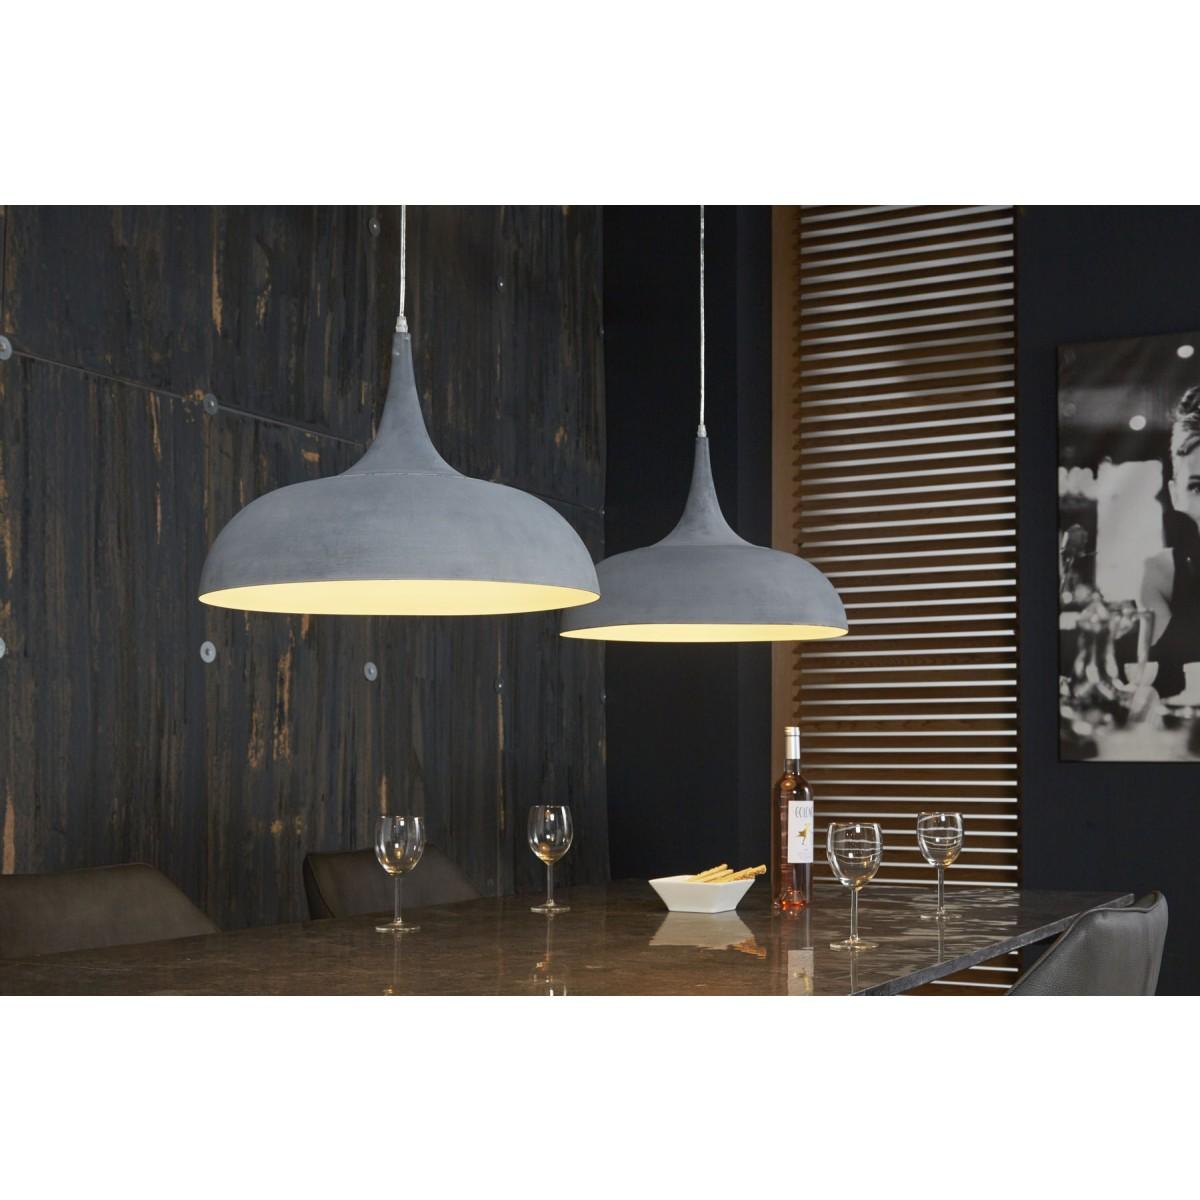 pendellampe grau metall h ngelampe betonoptik h ngeleuchte grau breite 140 cm. Black Bedroom Furniture Sets. Home Design Ideas